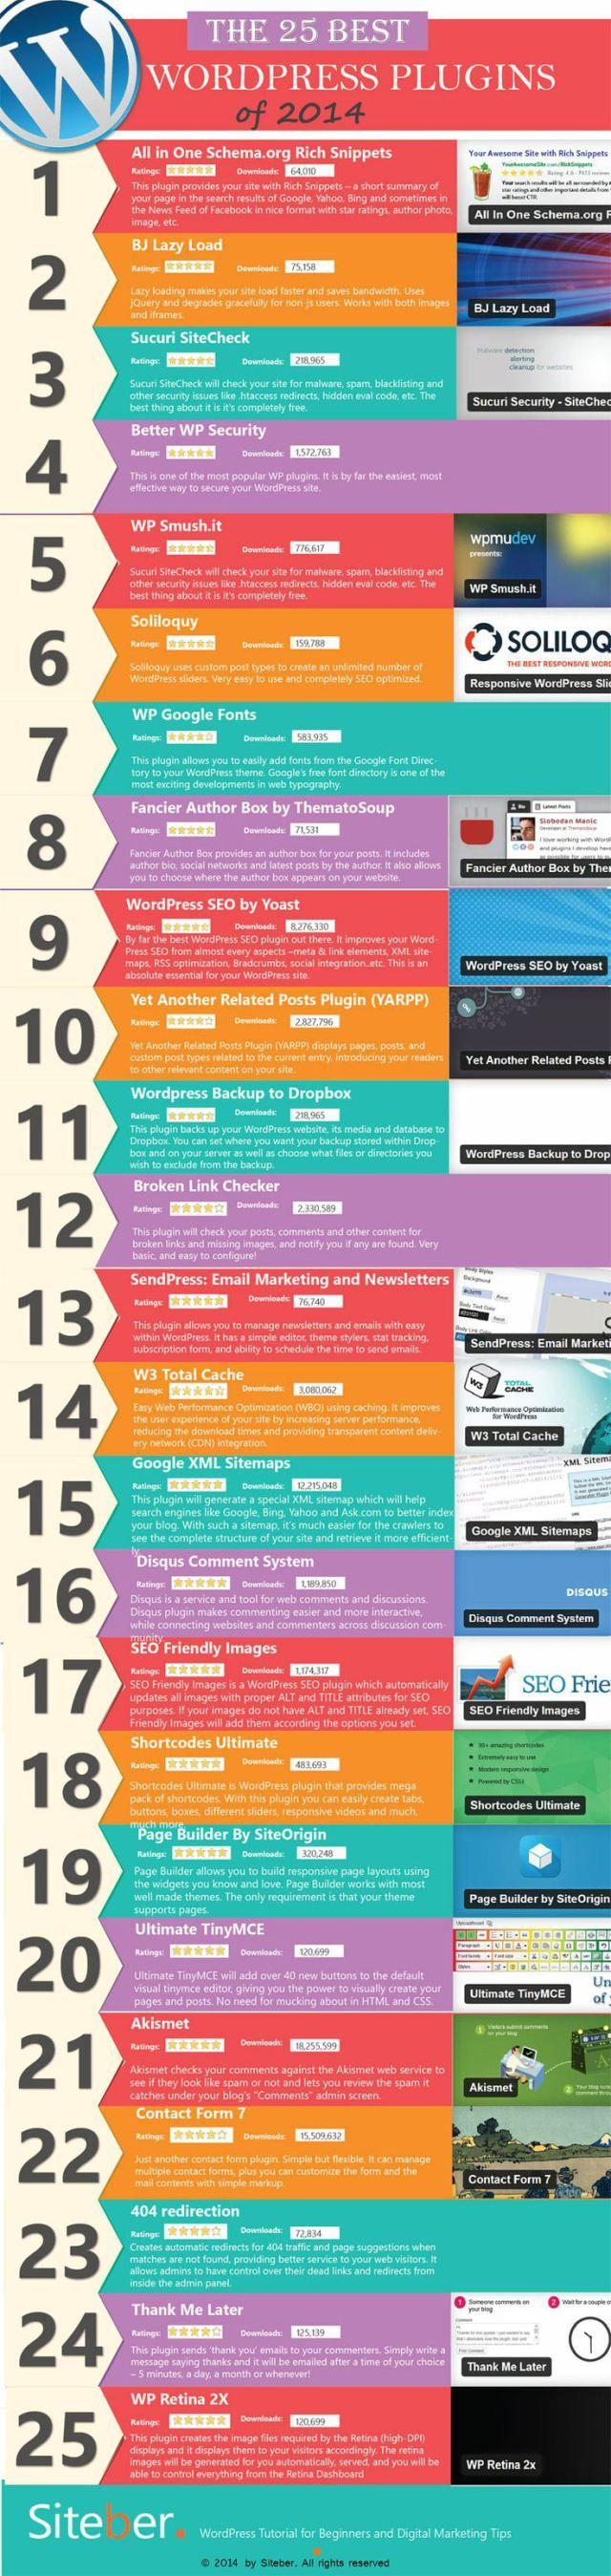 The 25 best WordPress plugins of 2014 #infografia #infographic